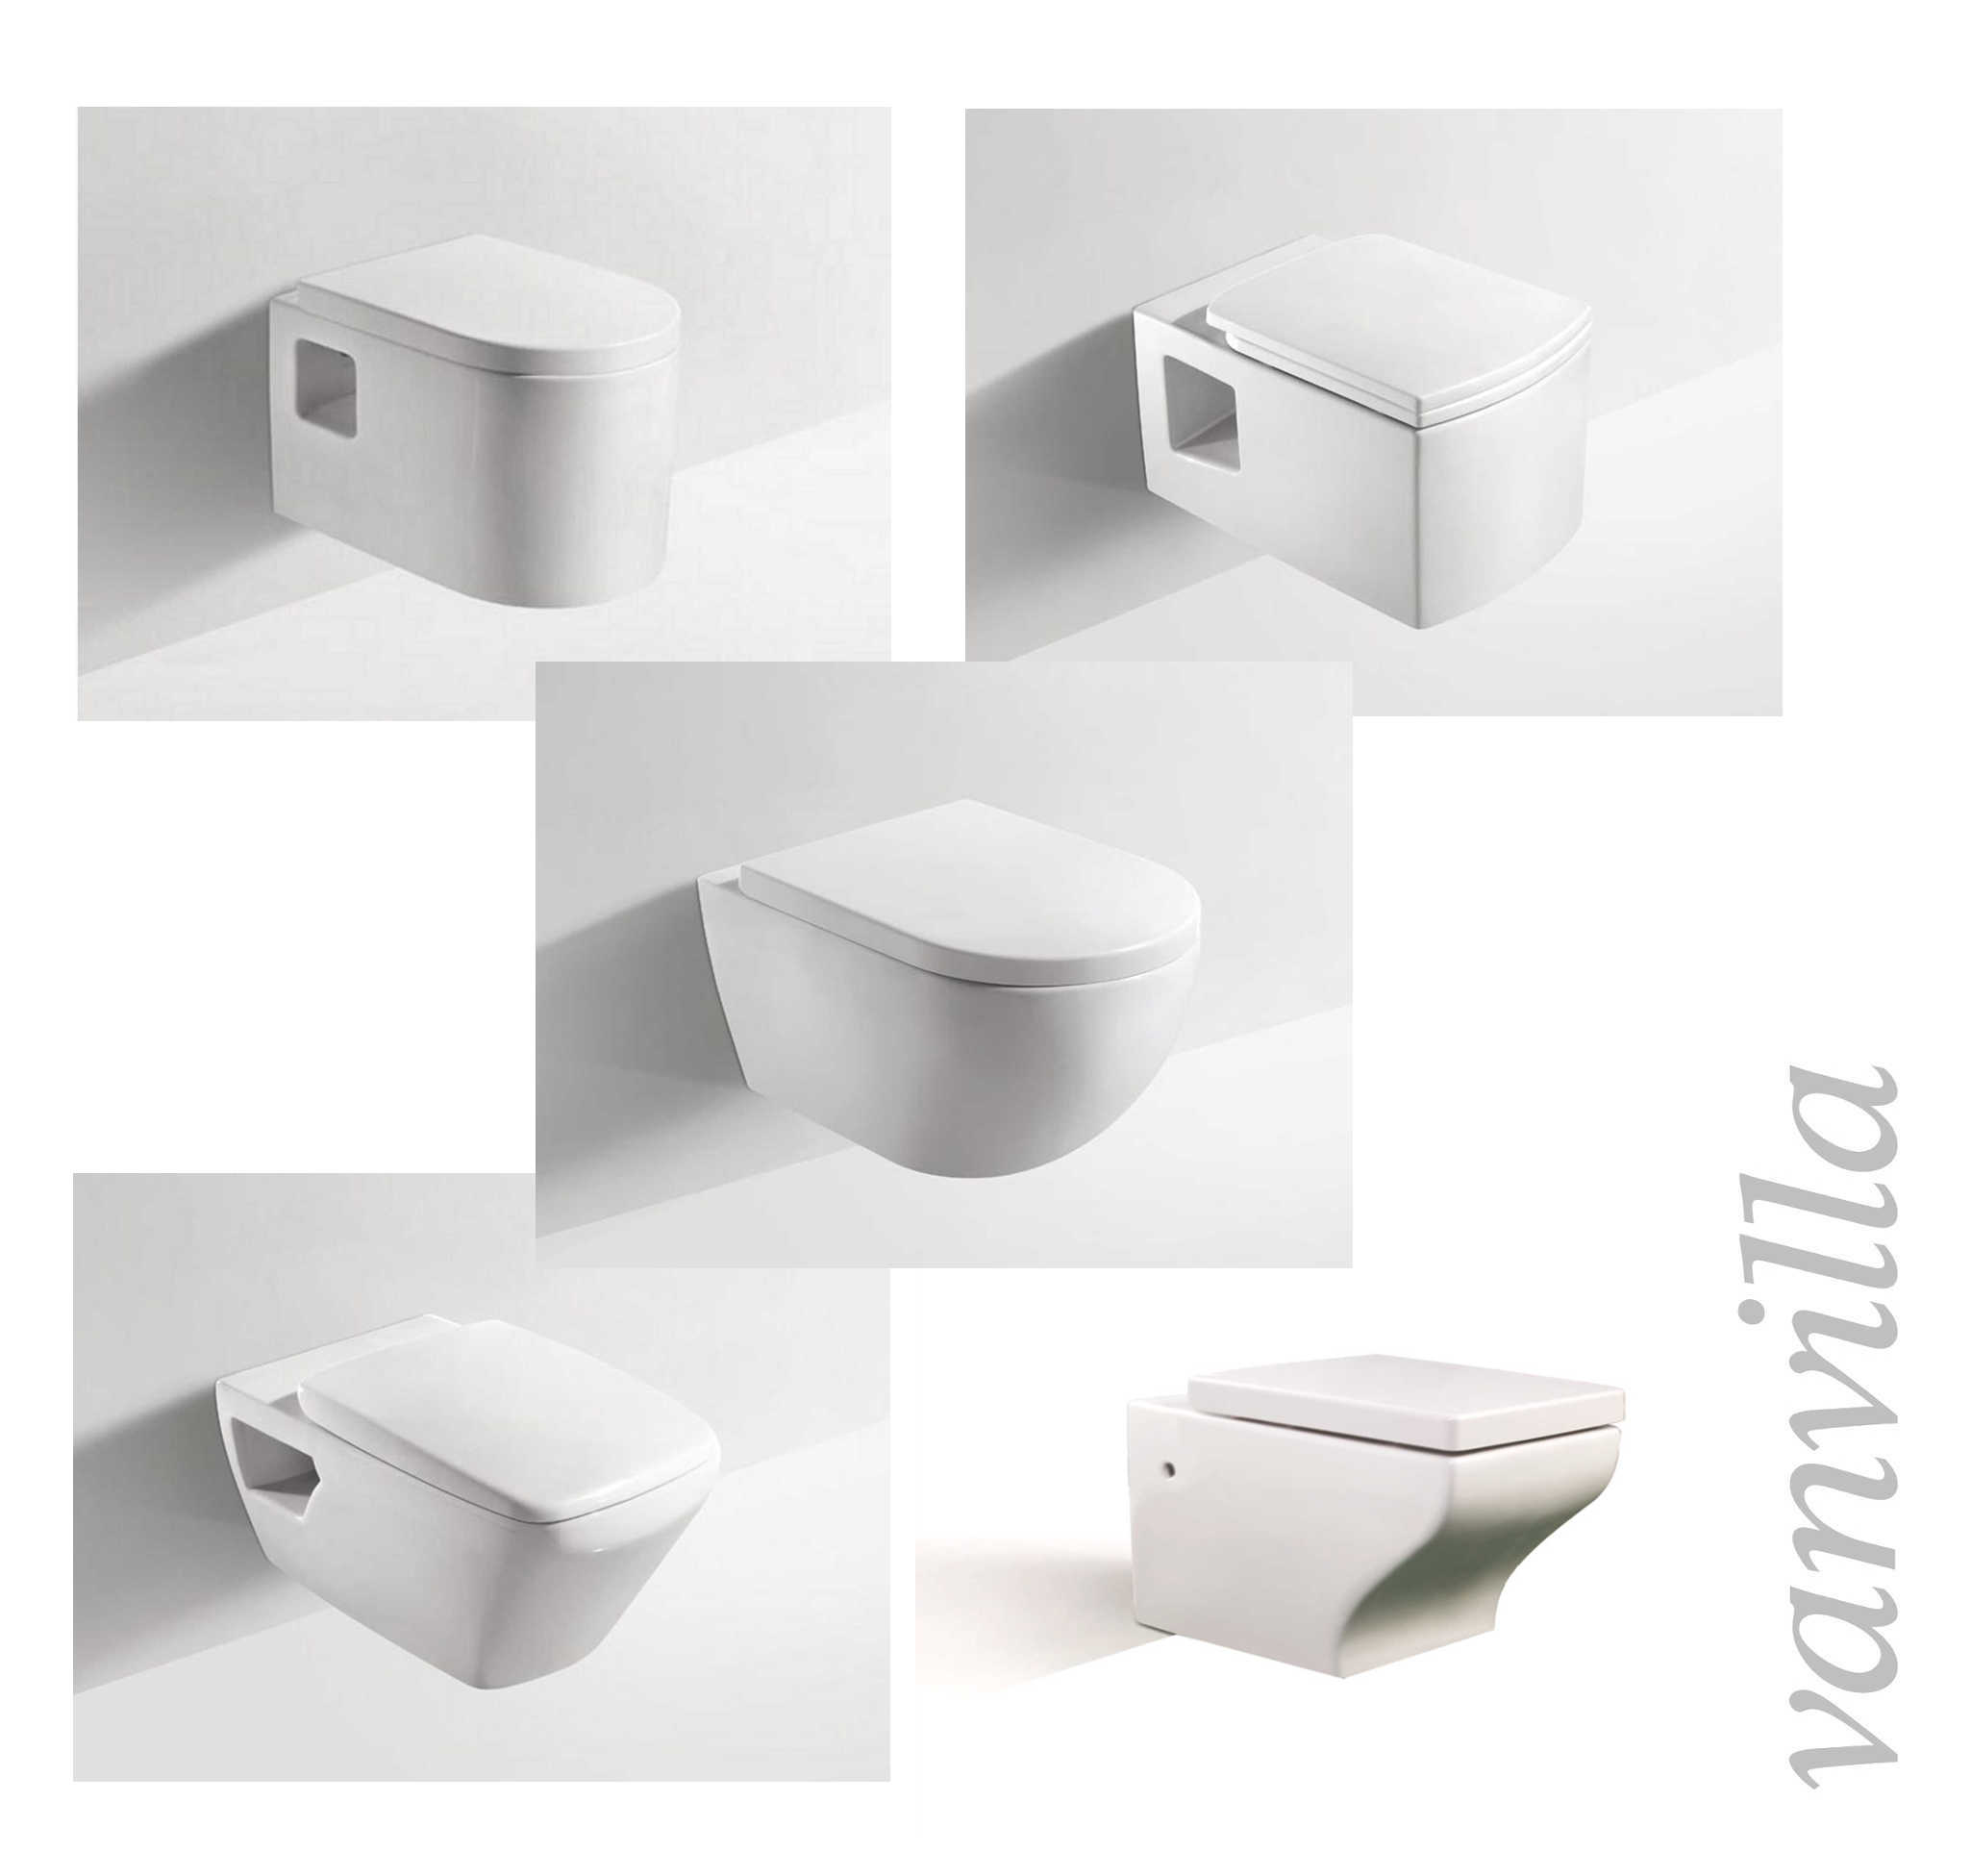 vanvilla dunstabzugshaube inselhaube cube 90cm edelstahl. Black Bedroom Furniture Sets. Home Design Ideas